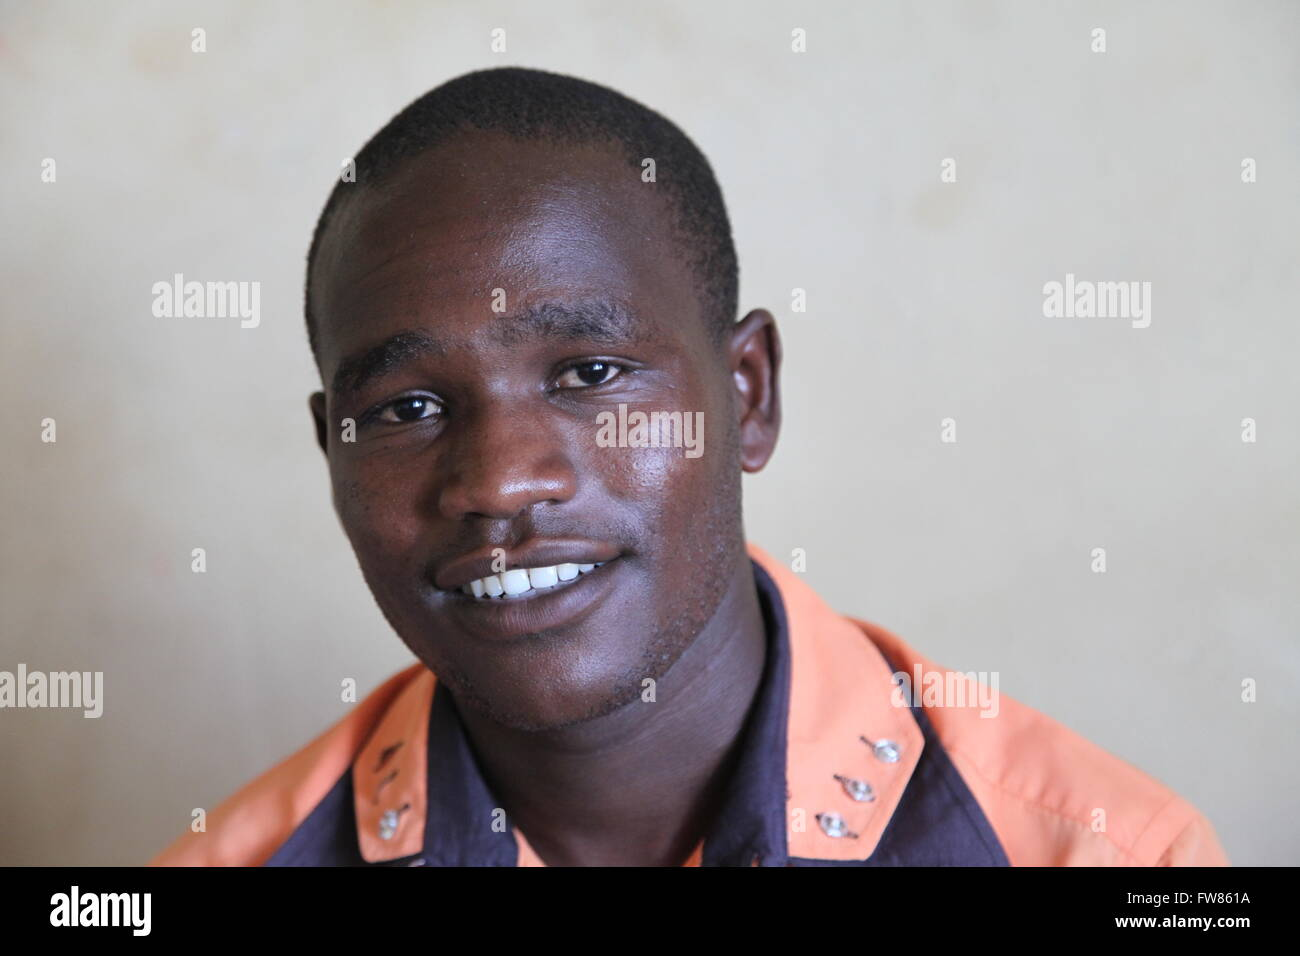 Dating in eldoret kenya, girls shaving anus